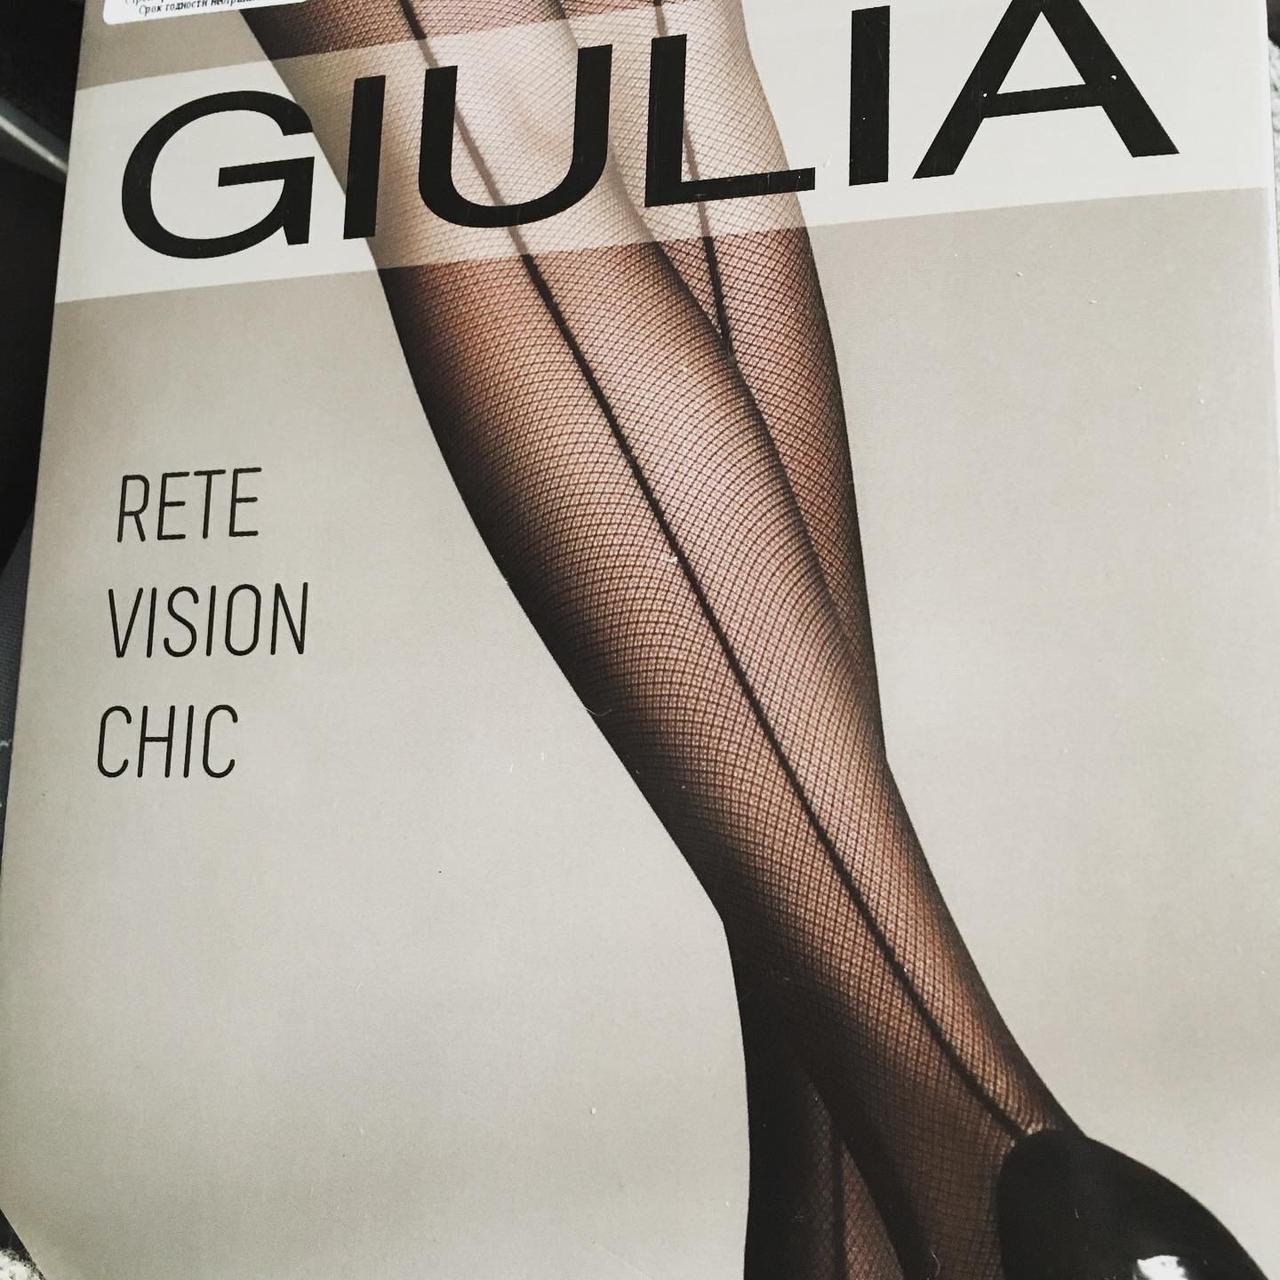 Rete Vision Chic 40 (1)